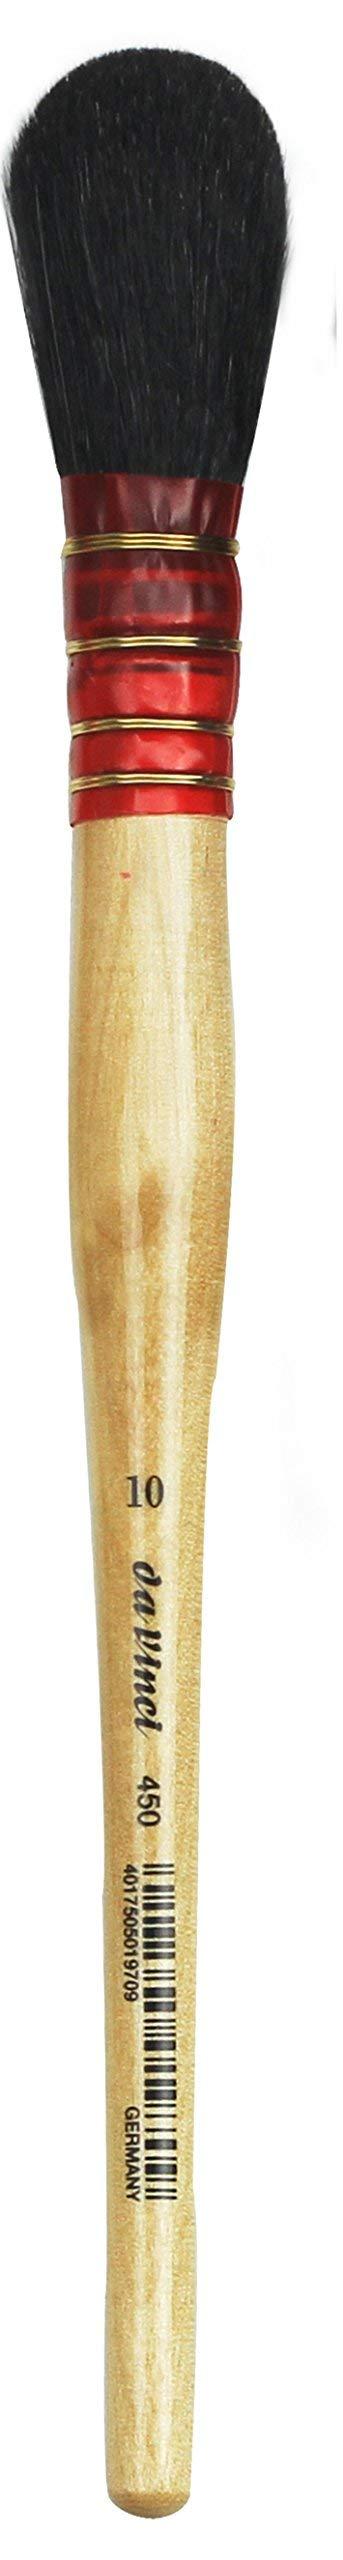 da Vinci Series 450 Black Goat Watercolor/Gilder Duster Oval Quill Paintbrush, Size 10 (450-10)